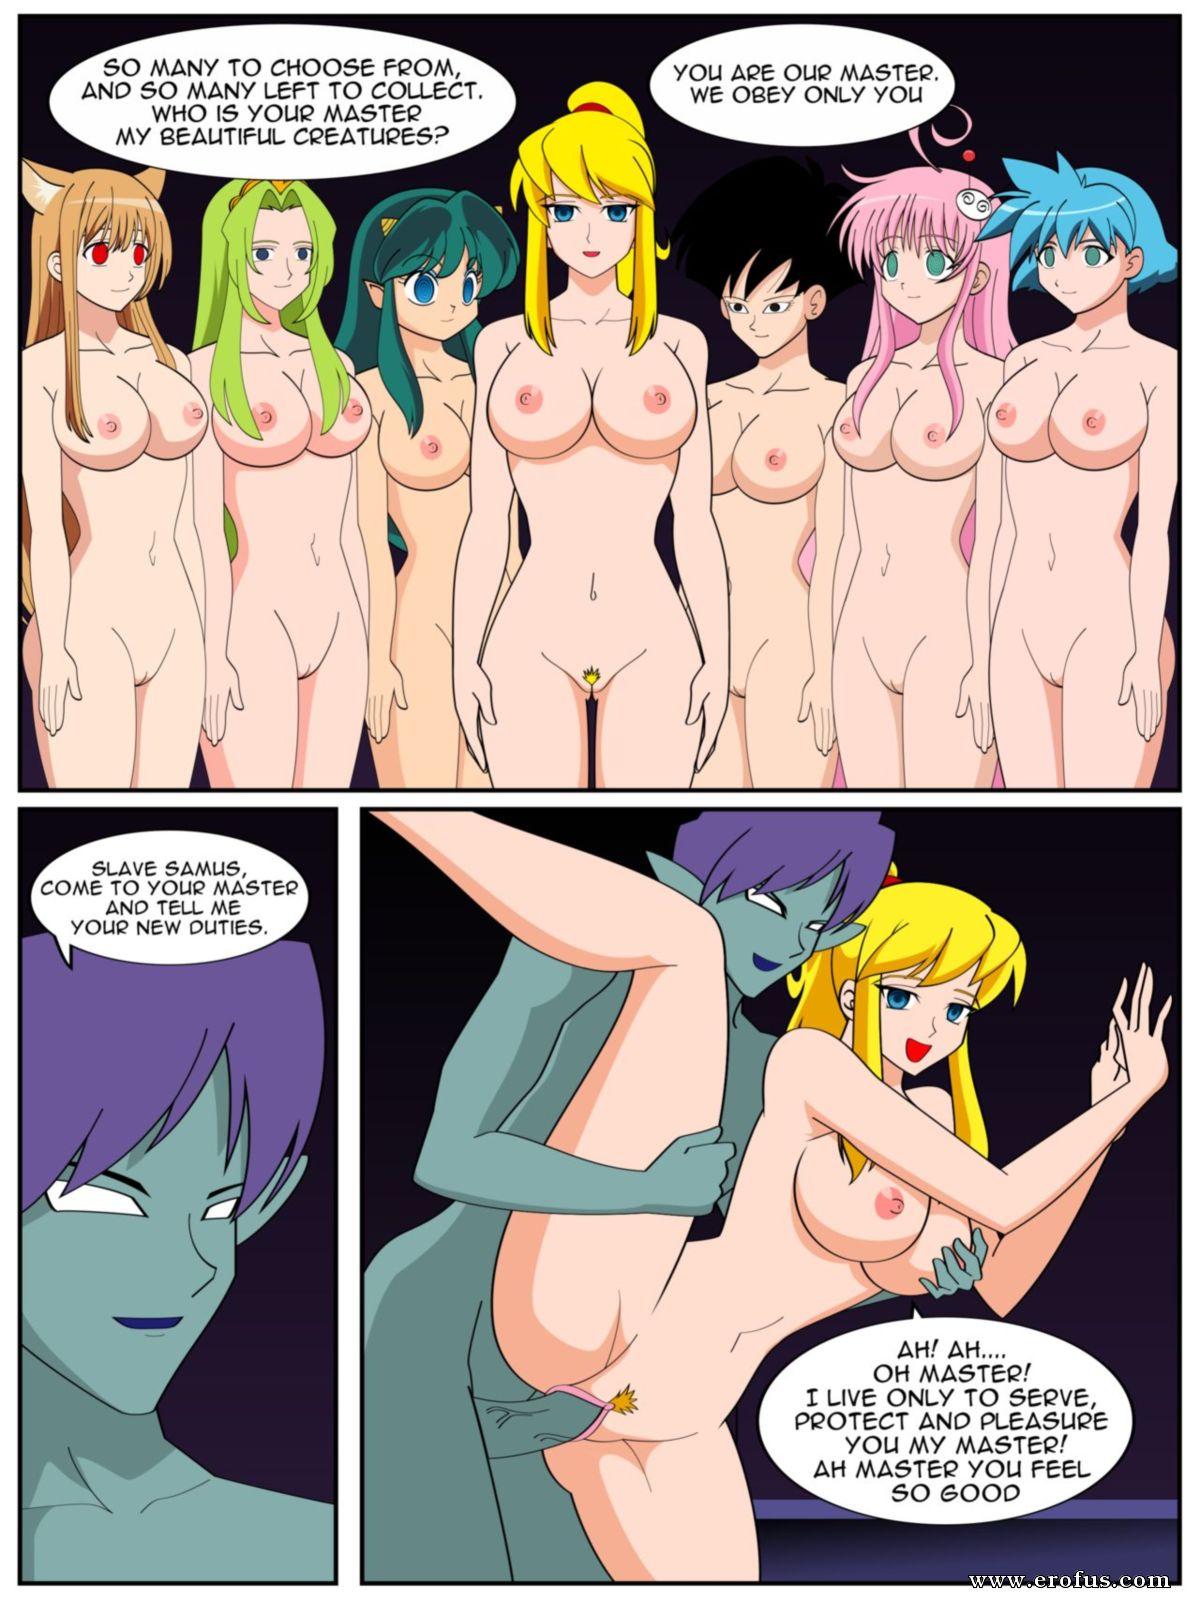 Samus aran porn page